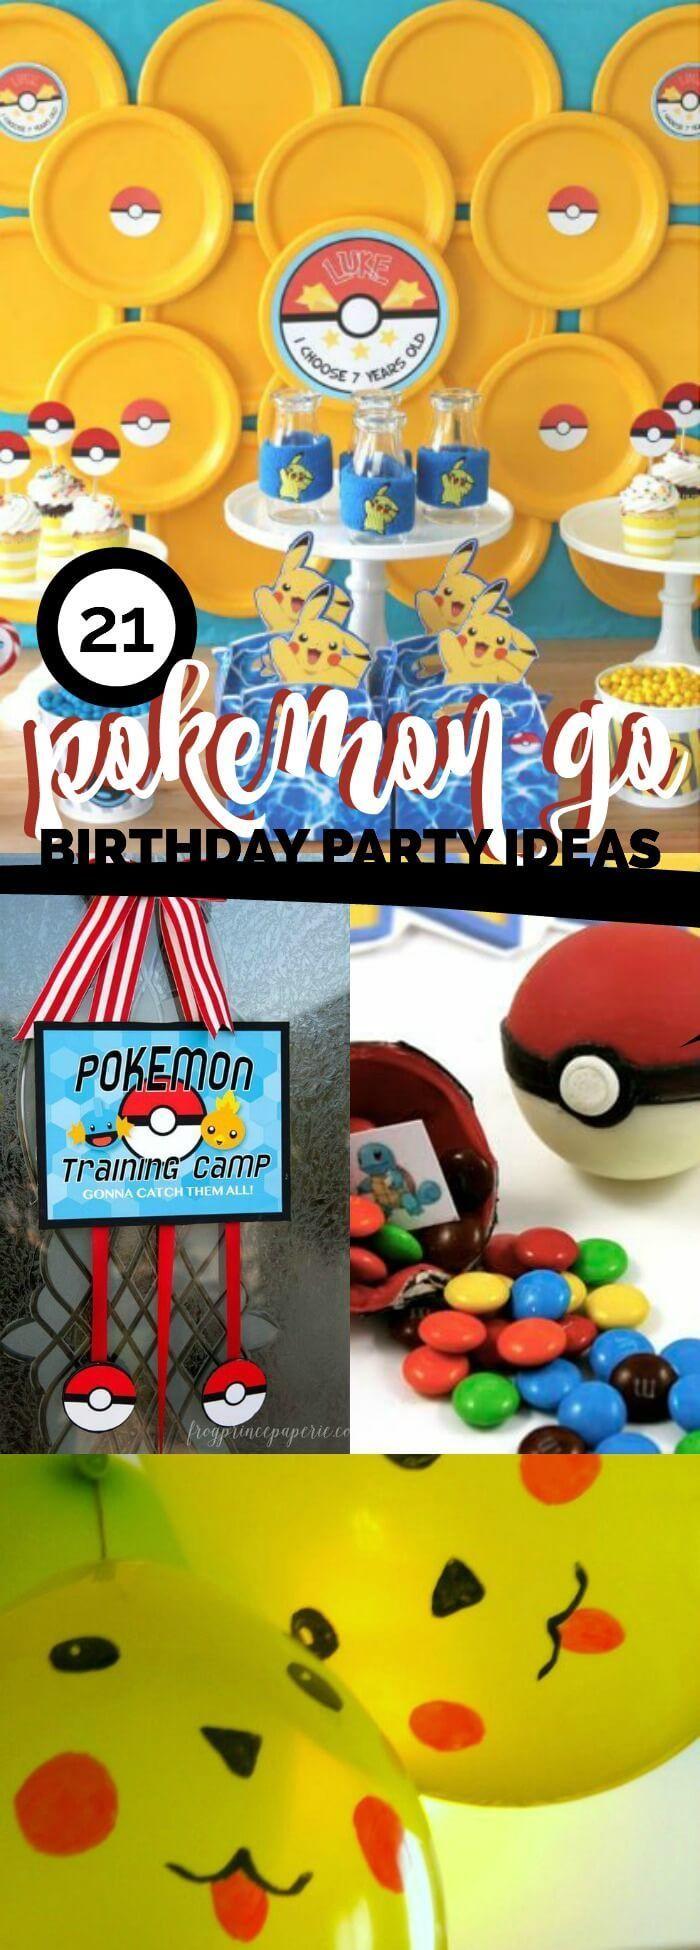 21 Top Pokemon Go Party Ideas!